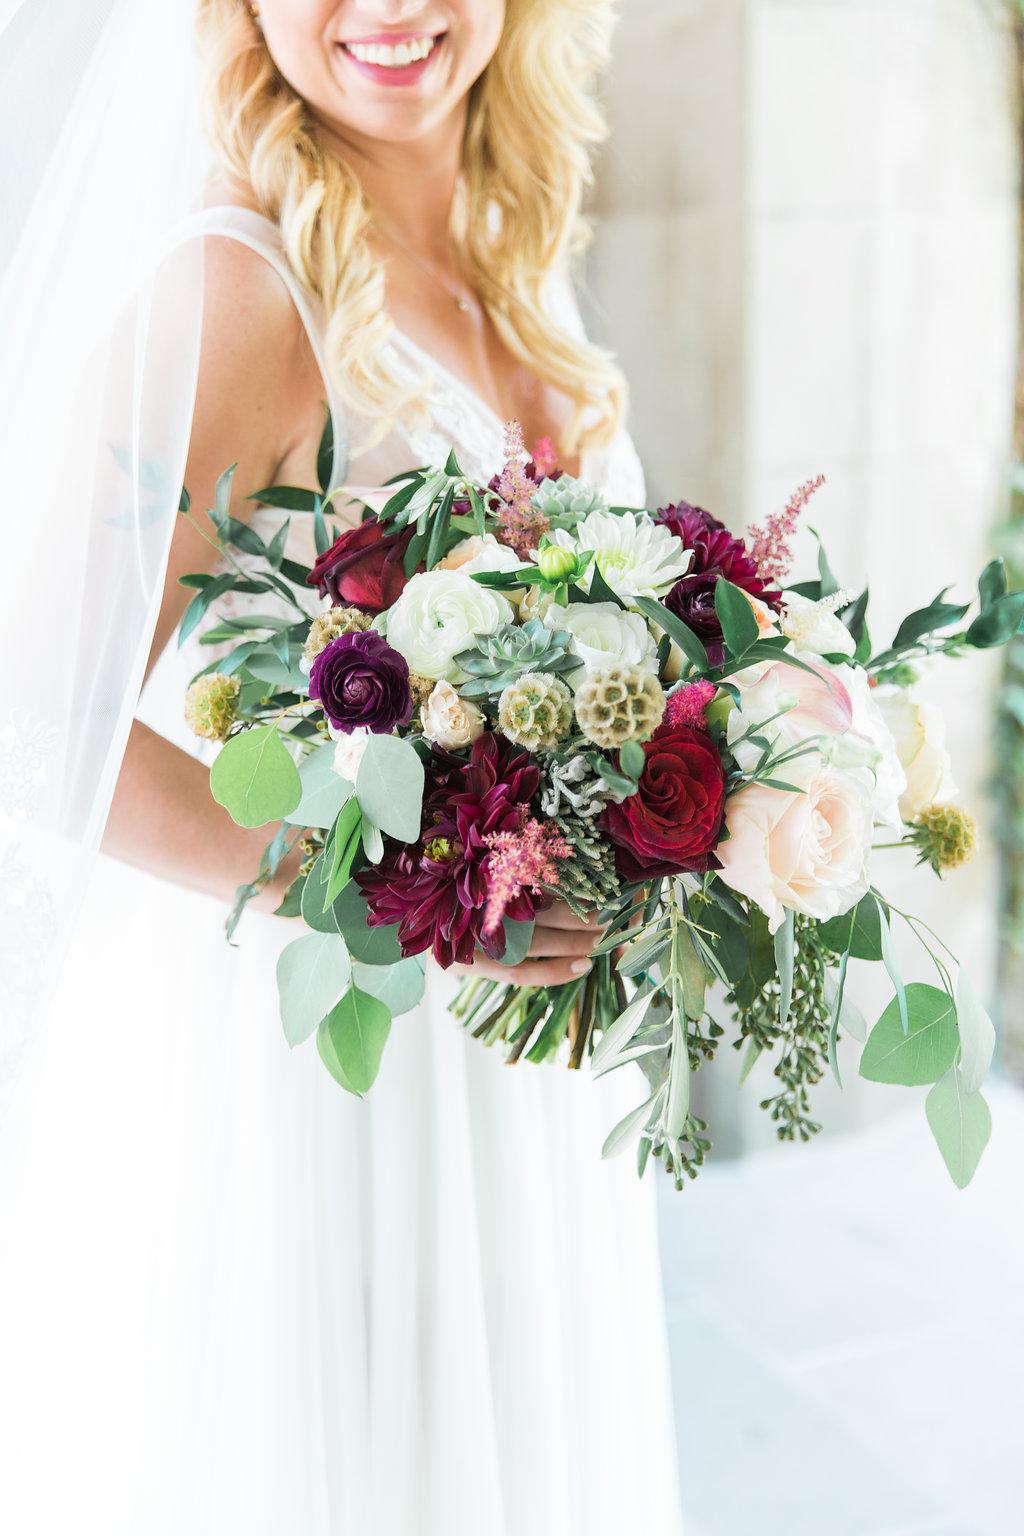 nicoleclarey_stacey+alexwedding_bride+groom-80.jpg